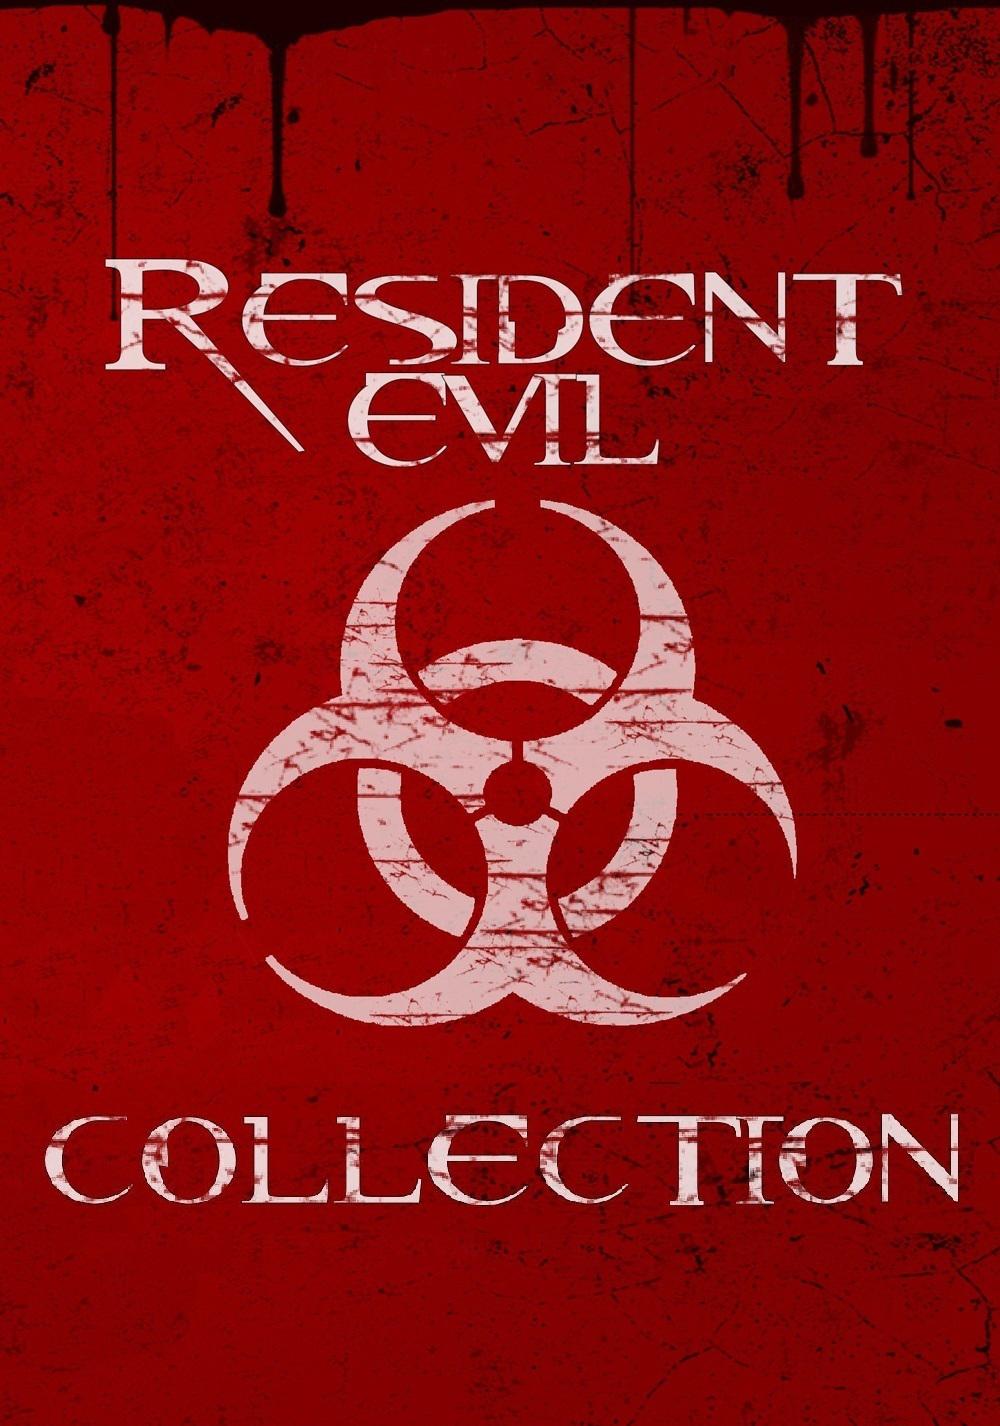 Resident Evil Collection   Movie fanart   fanart.tv